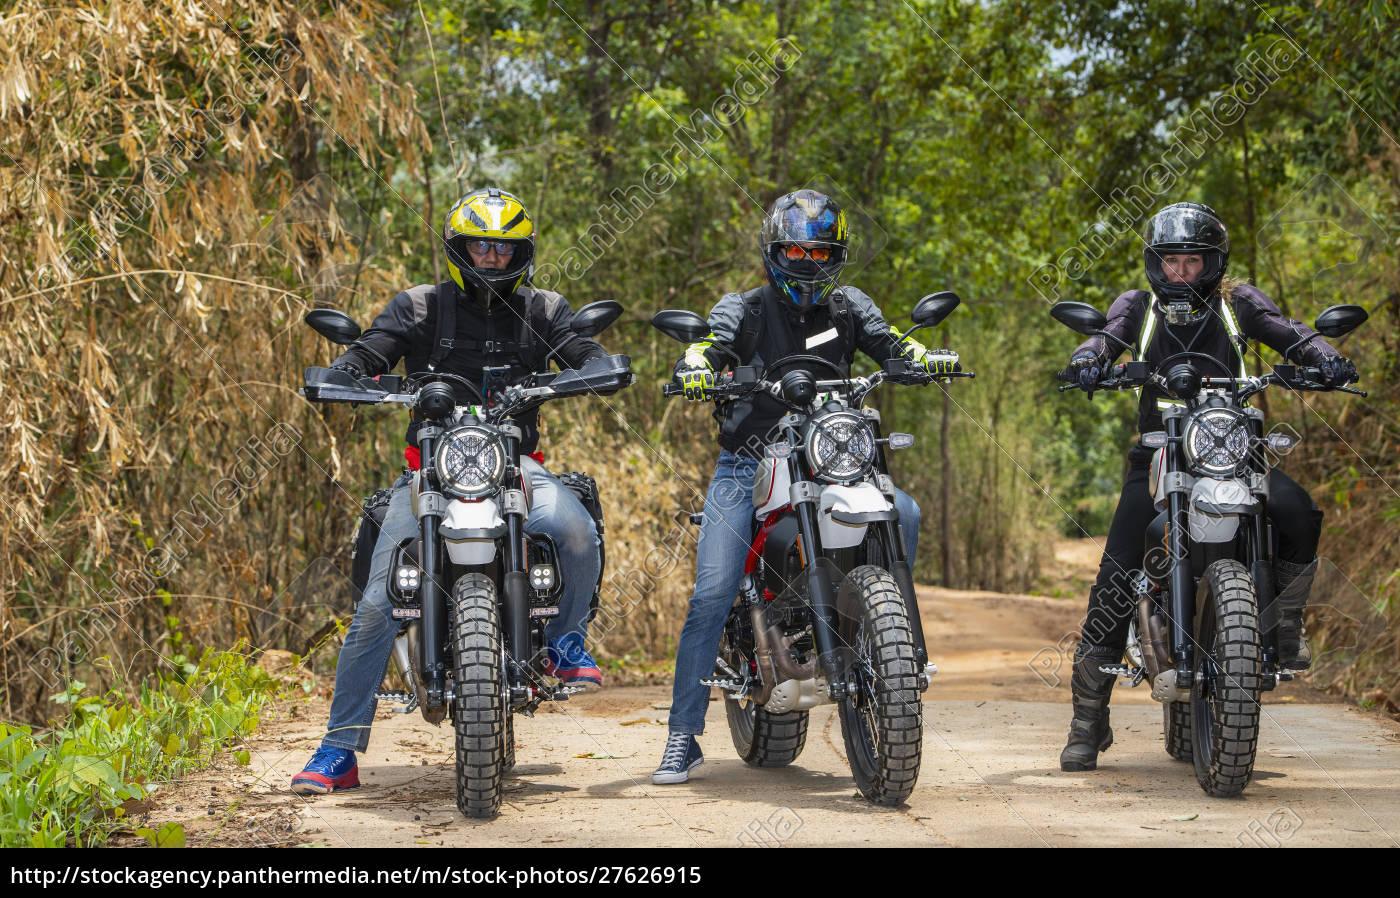 biker, fahren, off-road-motorrad, auf, feldweg, durch - 27626915